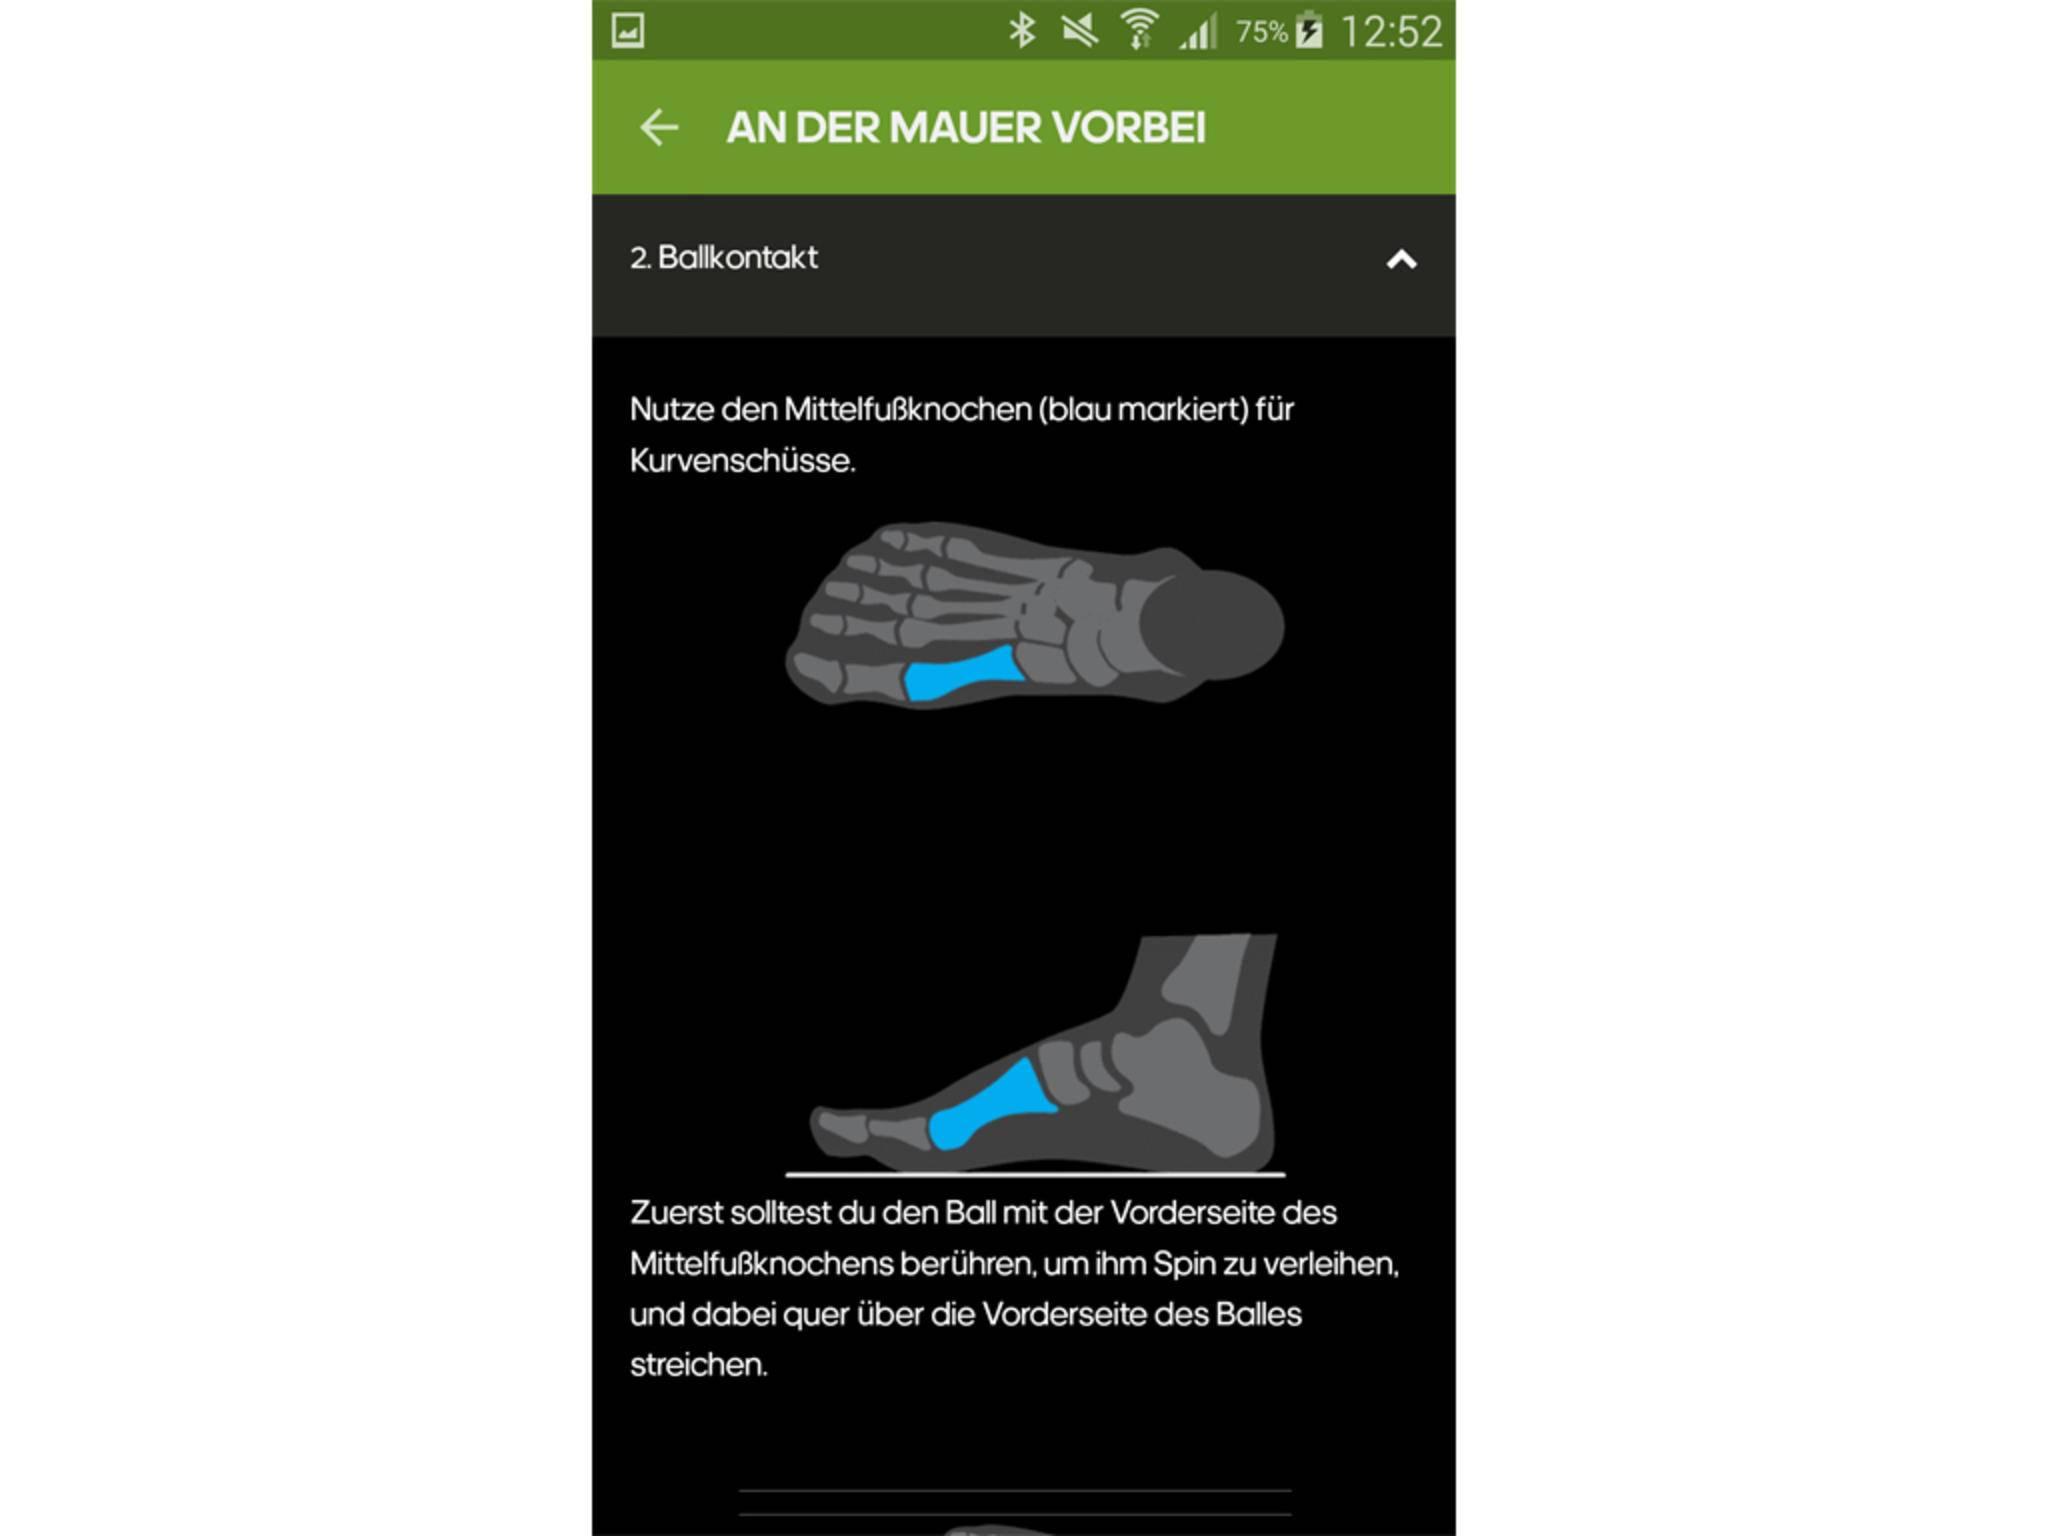 Adidas miCoach Smart Ball App 9